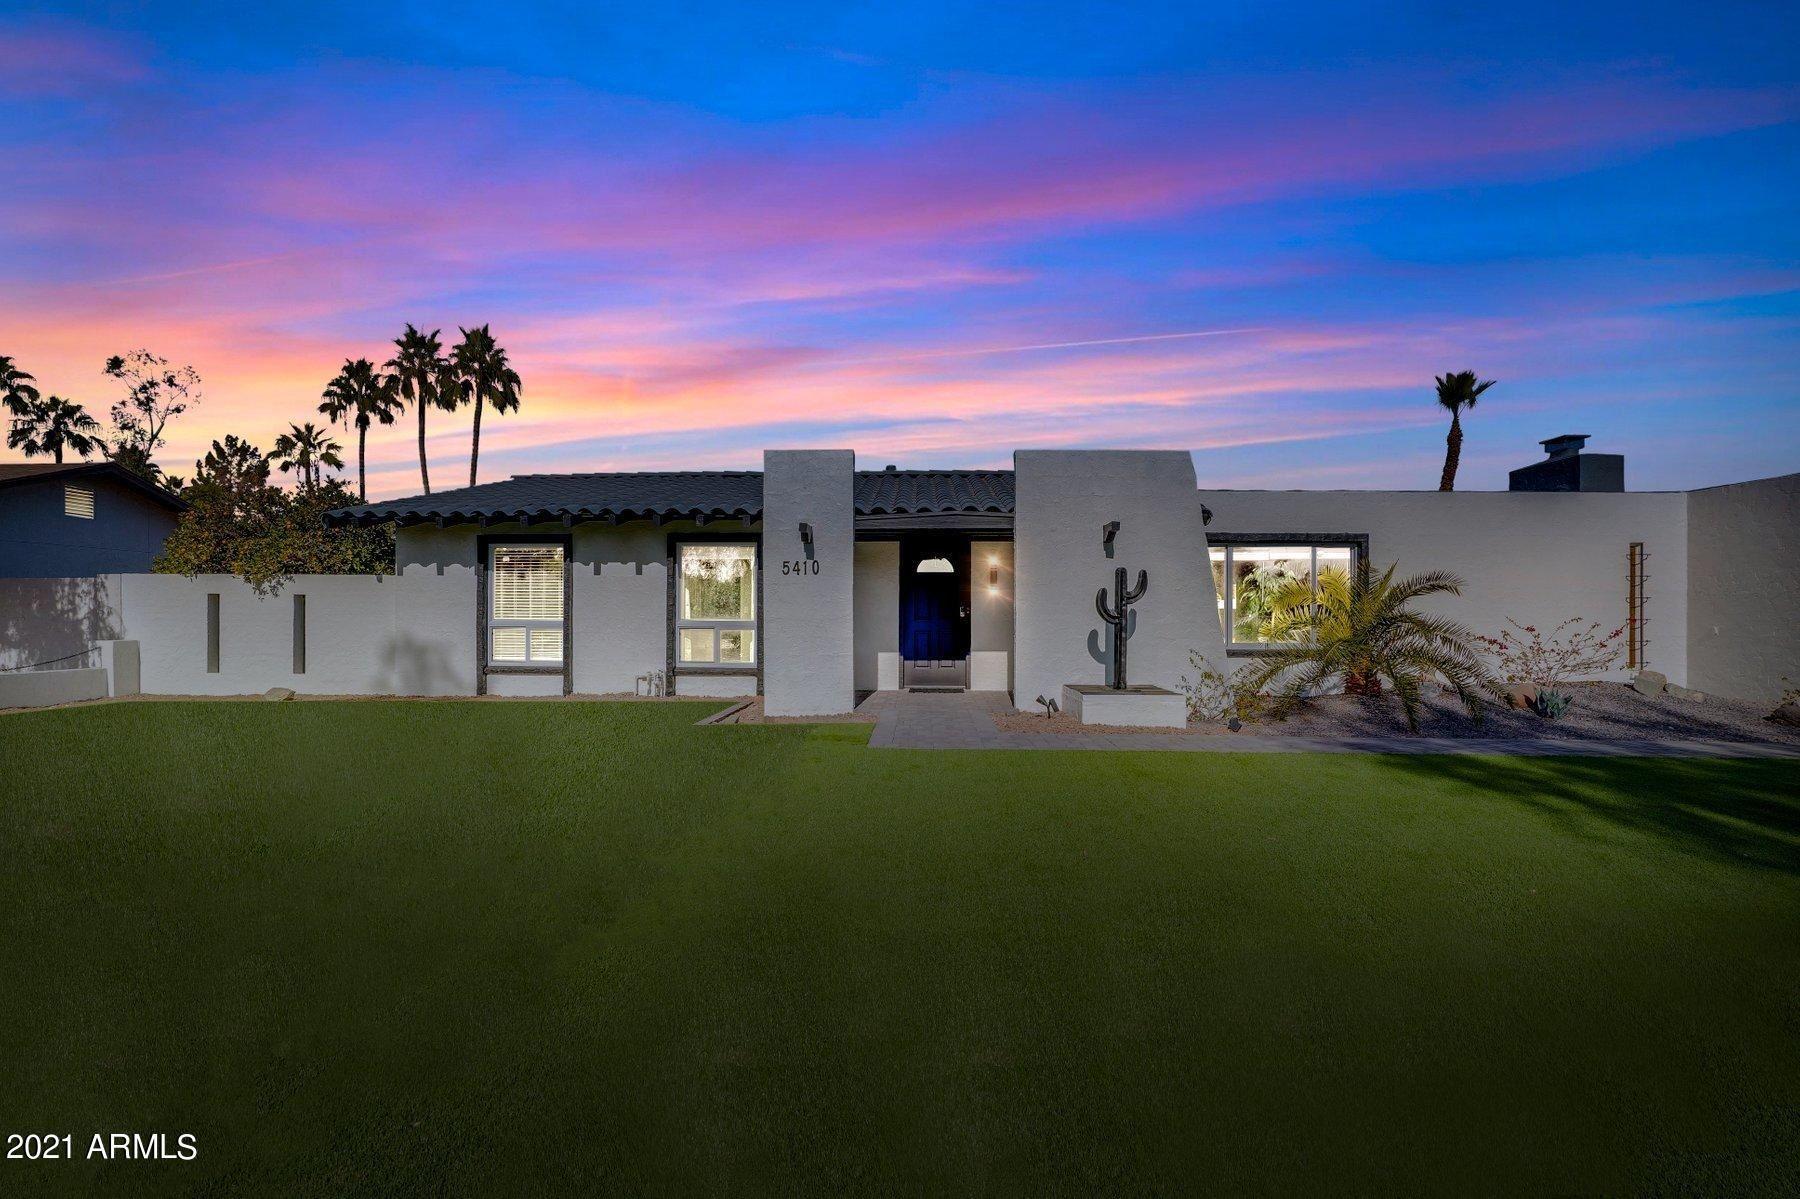 Photo for 5410 E CACTUS Road, Scottsdale, AZ 85254 (MLS # 6179195)